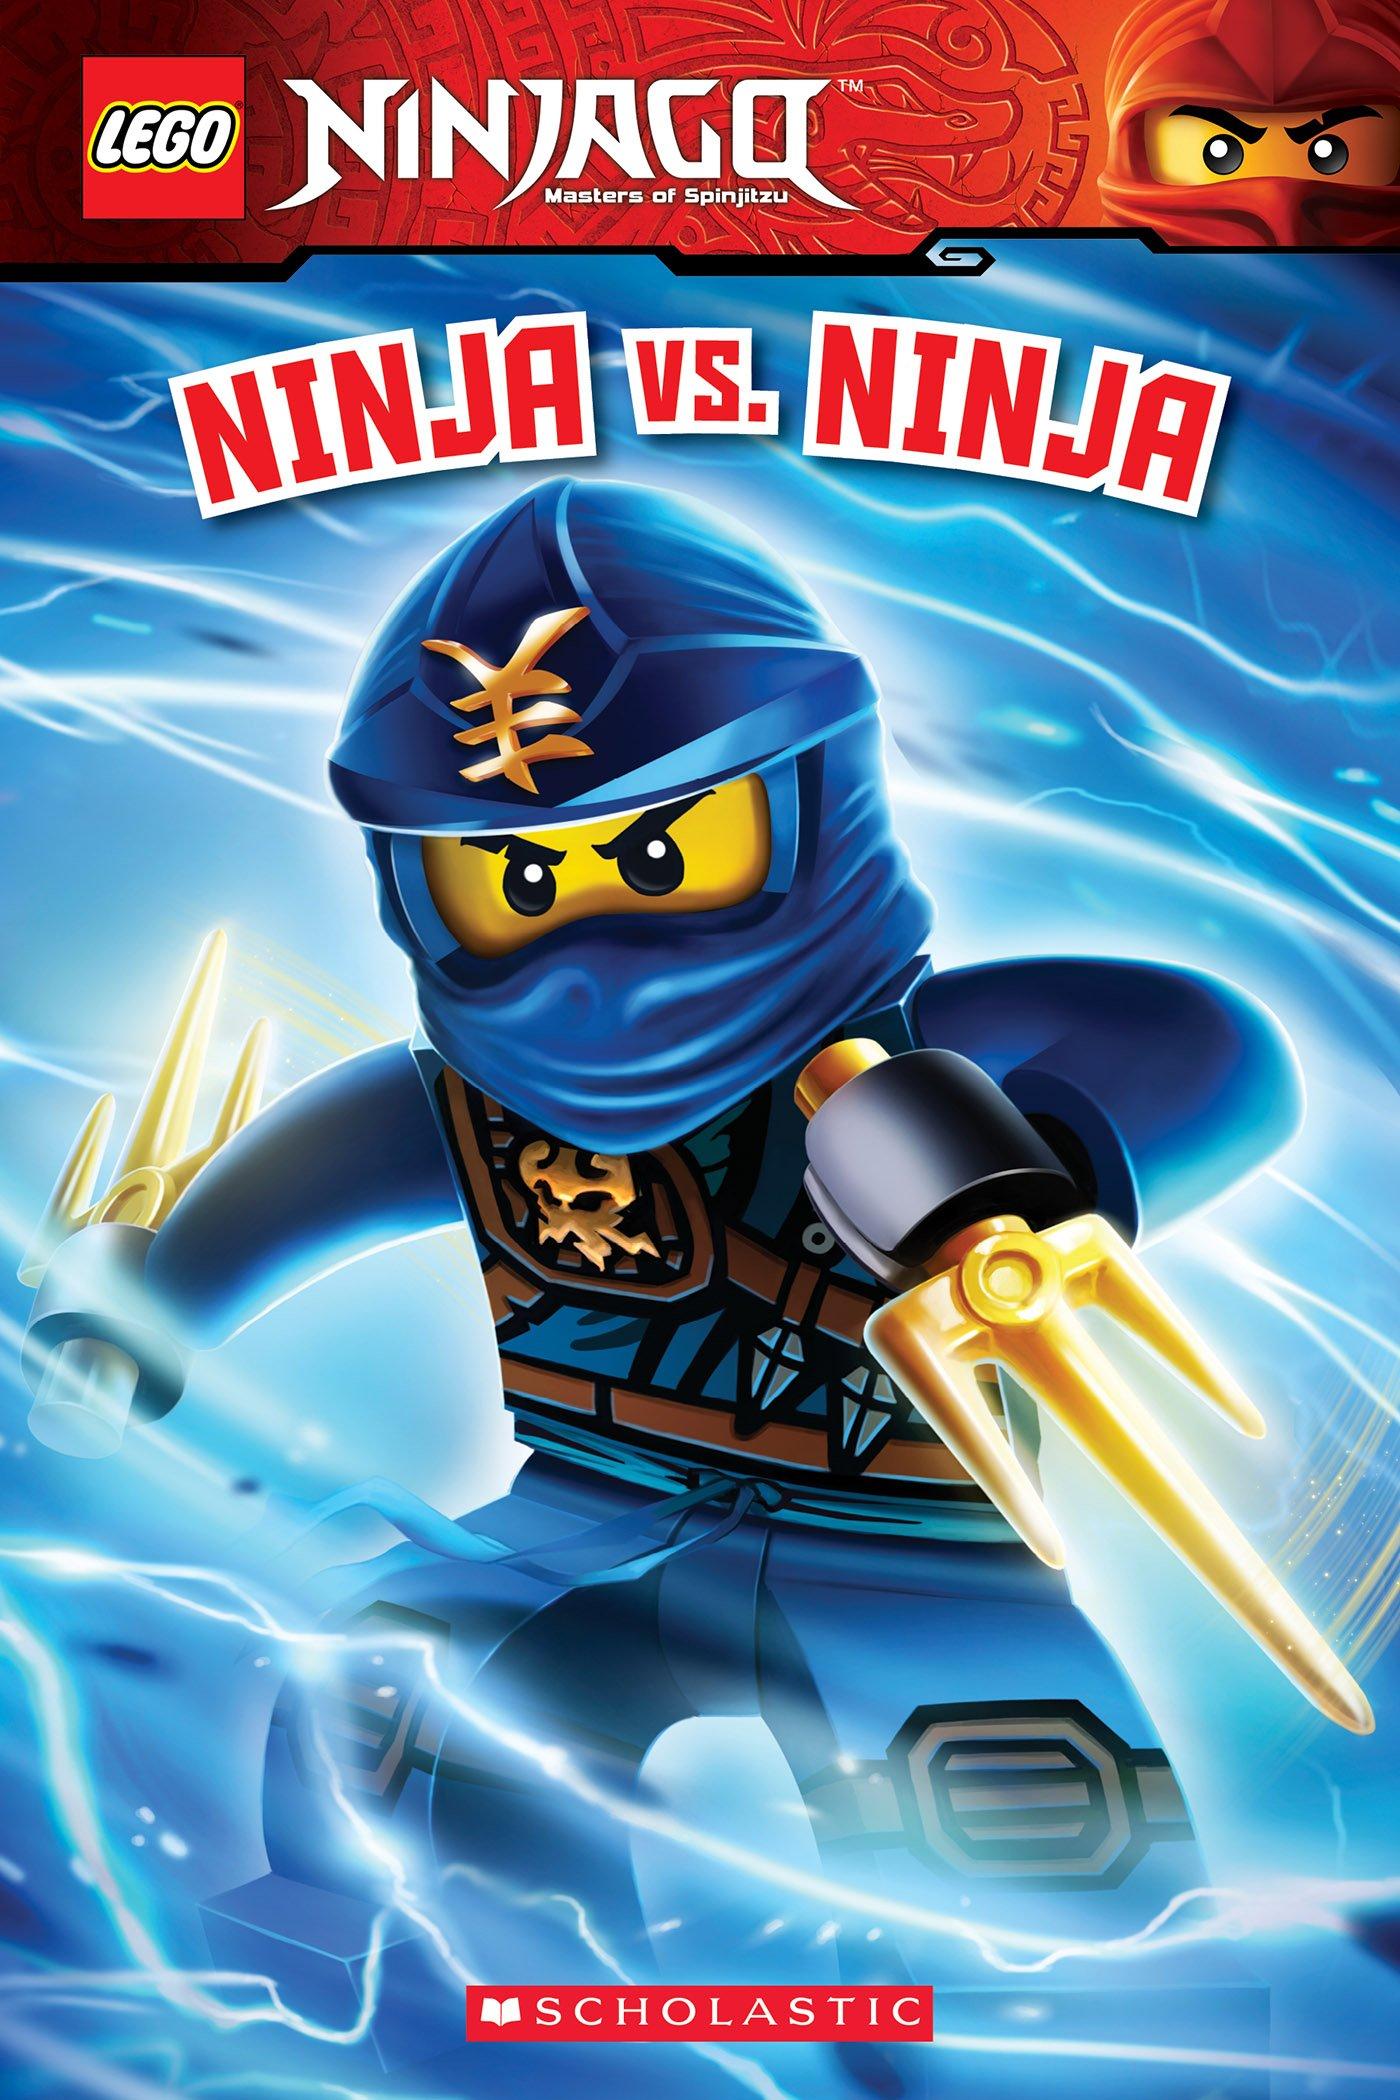 Amazon.com: LEGO Ninjago: Ninja vs Ninja (Reader #12 ...